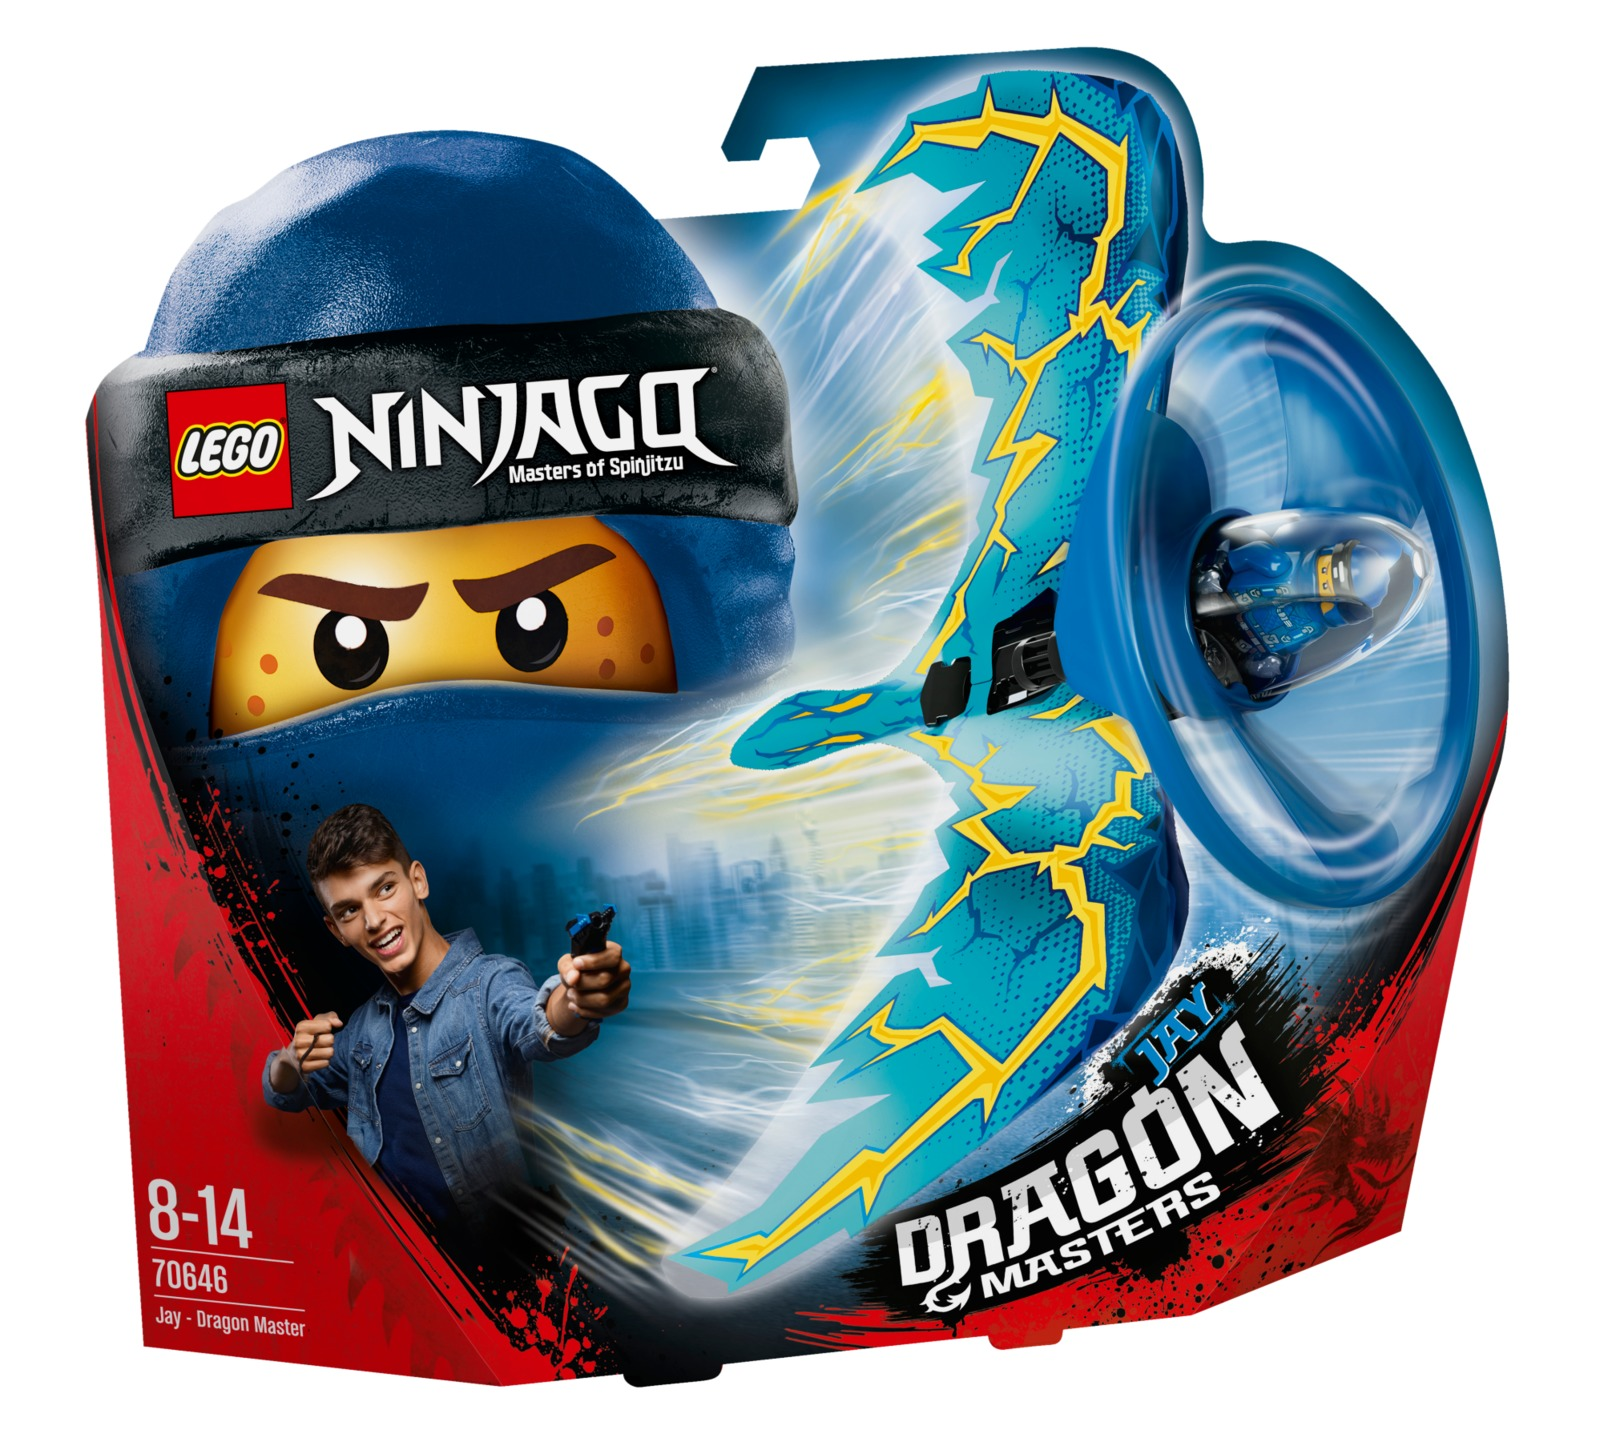 LEGO Ninjago - Jay Dragon Master (70646) image